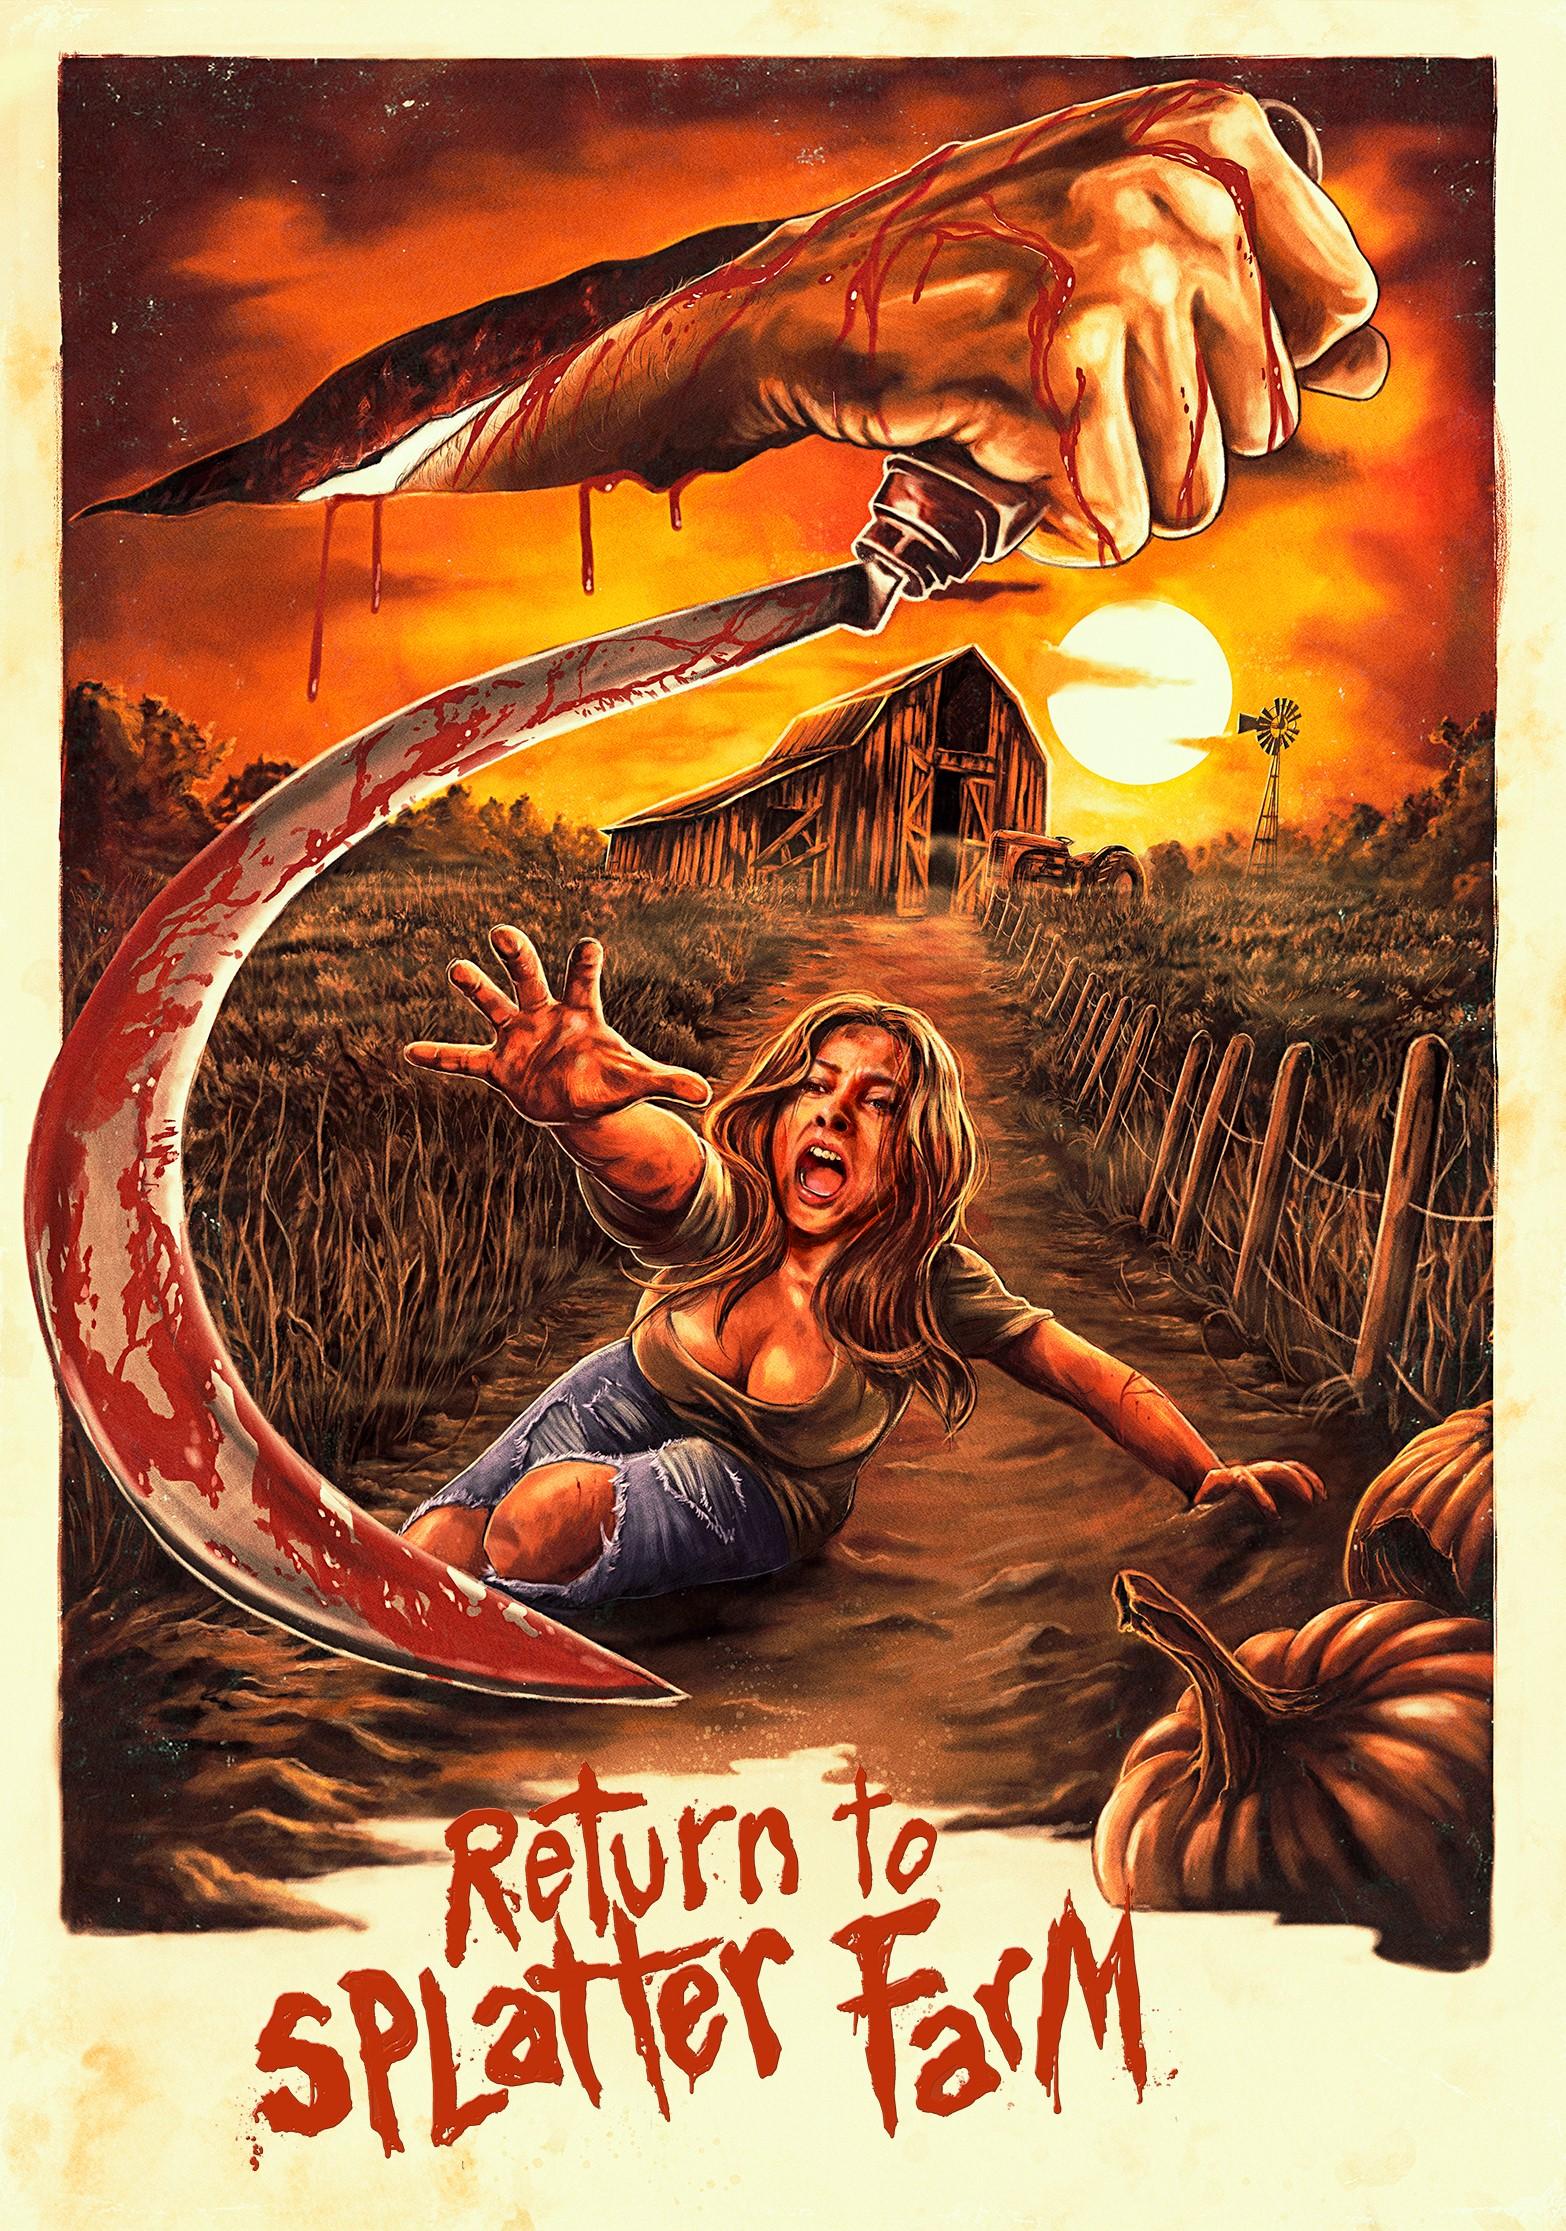 Return to Splatter Farm (2020) WebRip 720p Dual Audio [Hindi (Voice Over) Dubbed + English] [Full Movie]